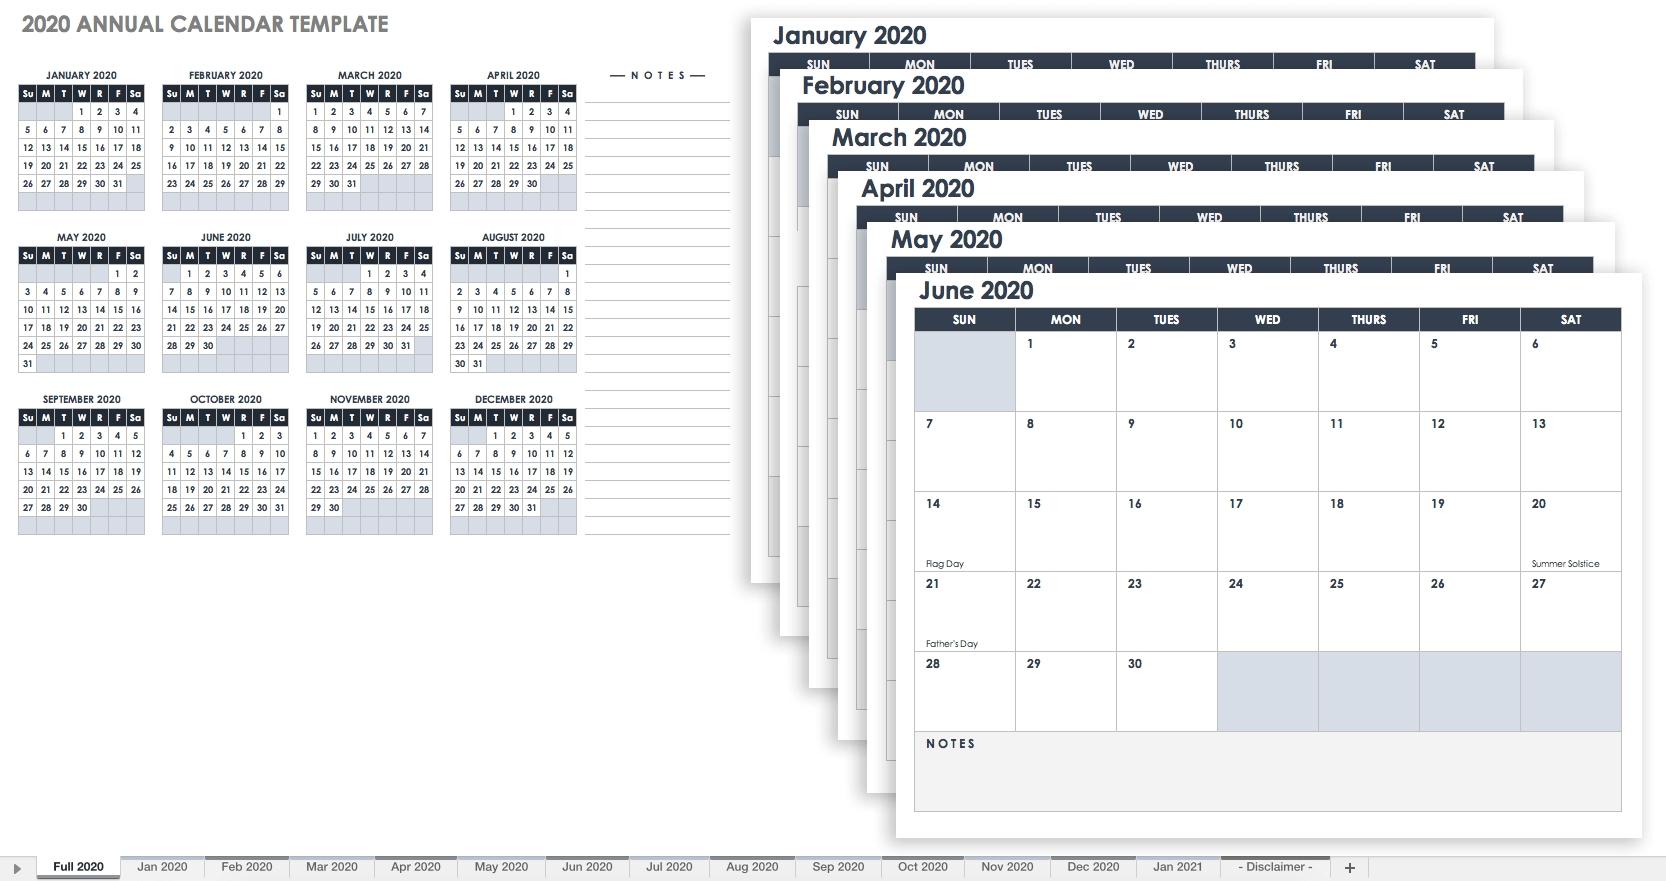 Free, Printable Excel Calendar Templates For 2019 & On | Smartsheet 5 Month Calendar Template